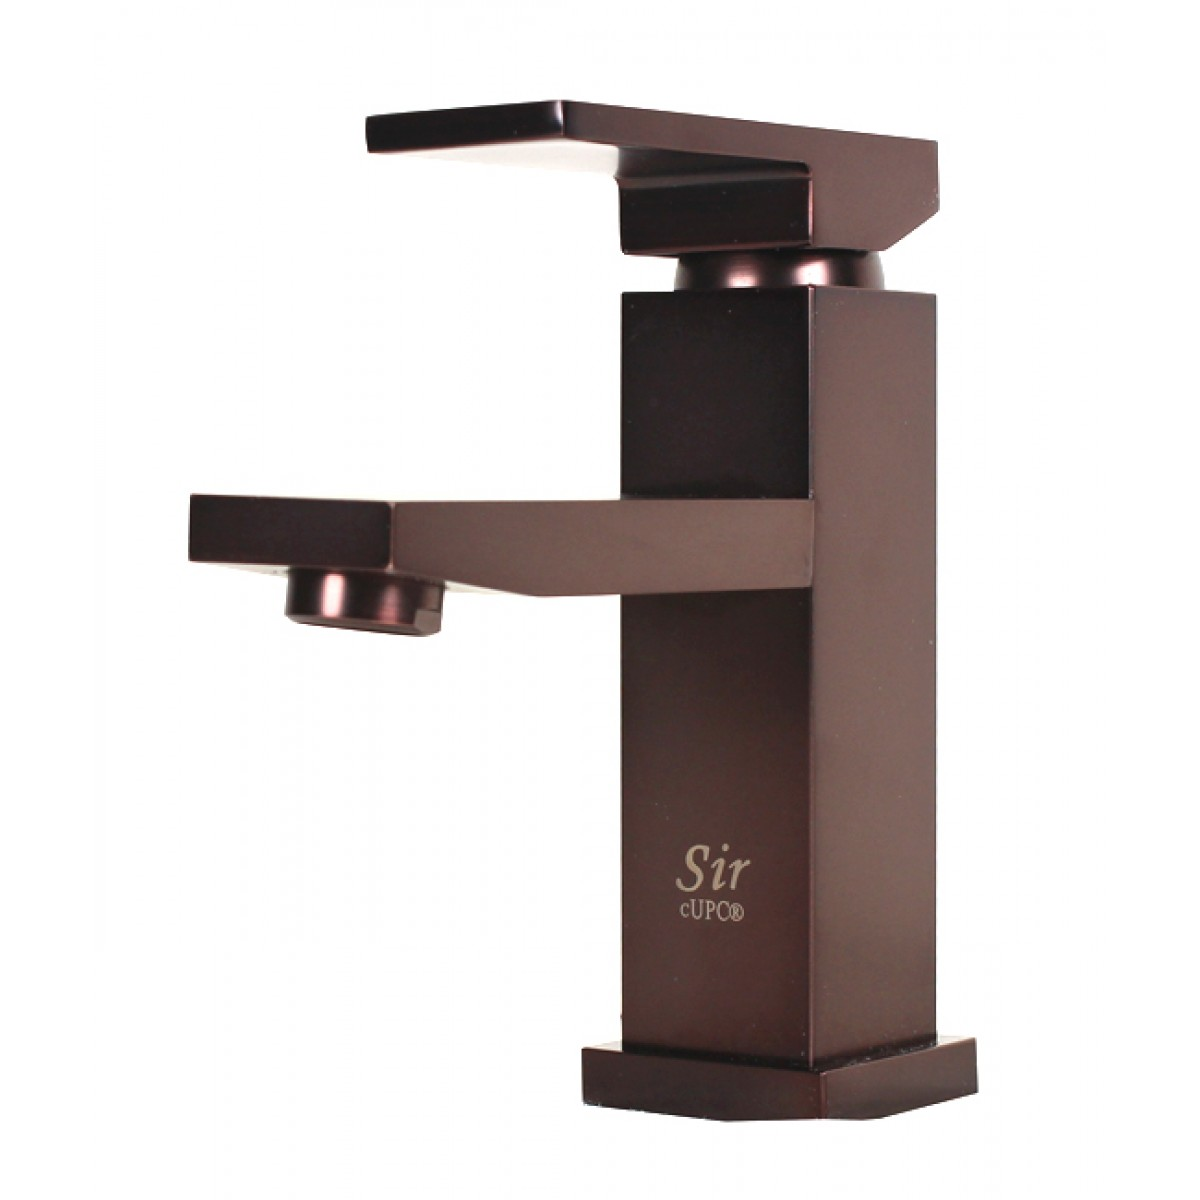 Lead Free Oil Rubbed Bronze Bathroom Lavatory Vessel Sink Faucet - 6 ...